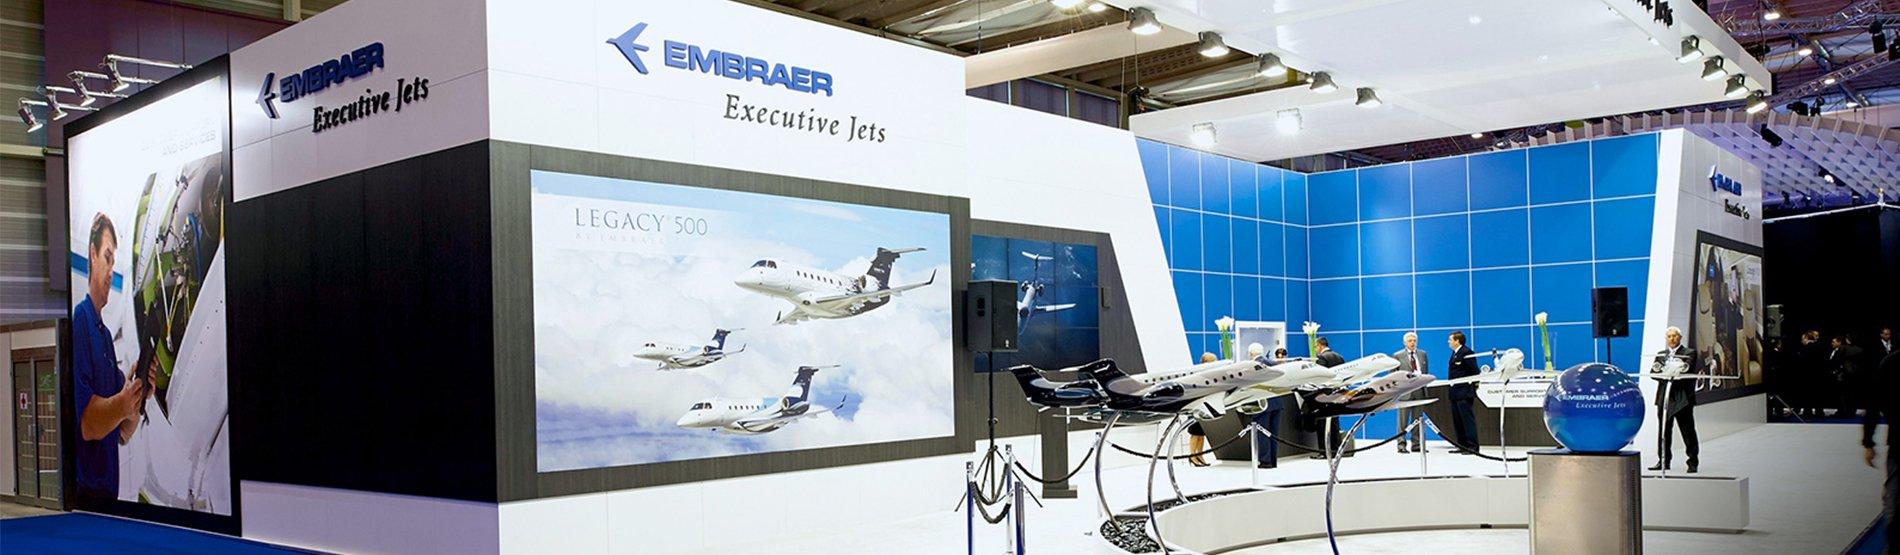 embraer trade show exhibit